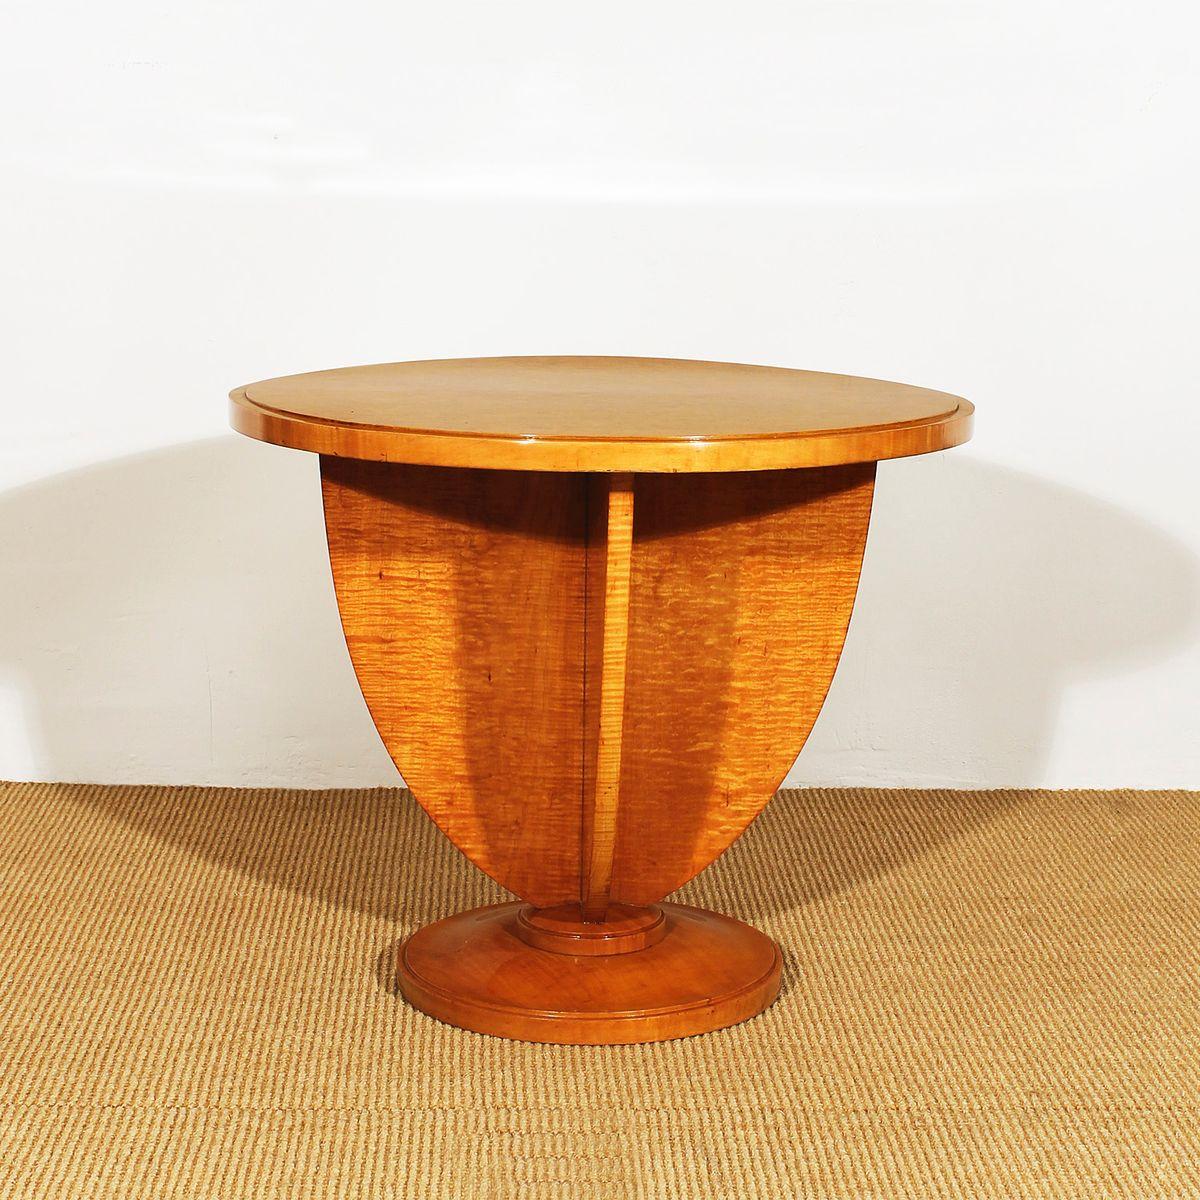 franz sischer art deco ahornholz beistelltisch 1925 bei. Black Bedroom Furniture Sets. Home Design Ideas